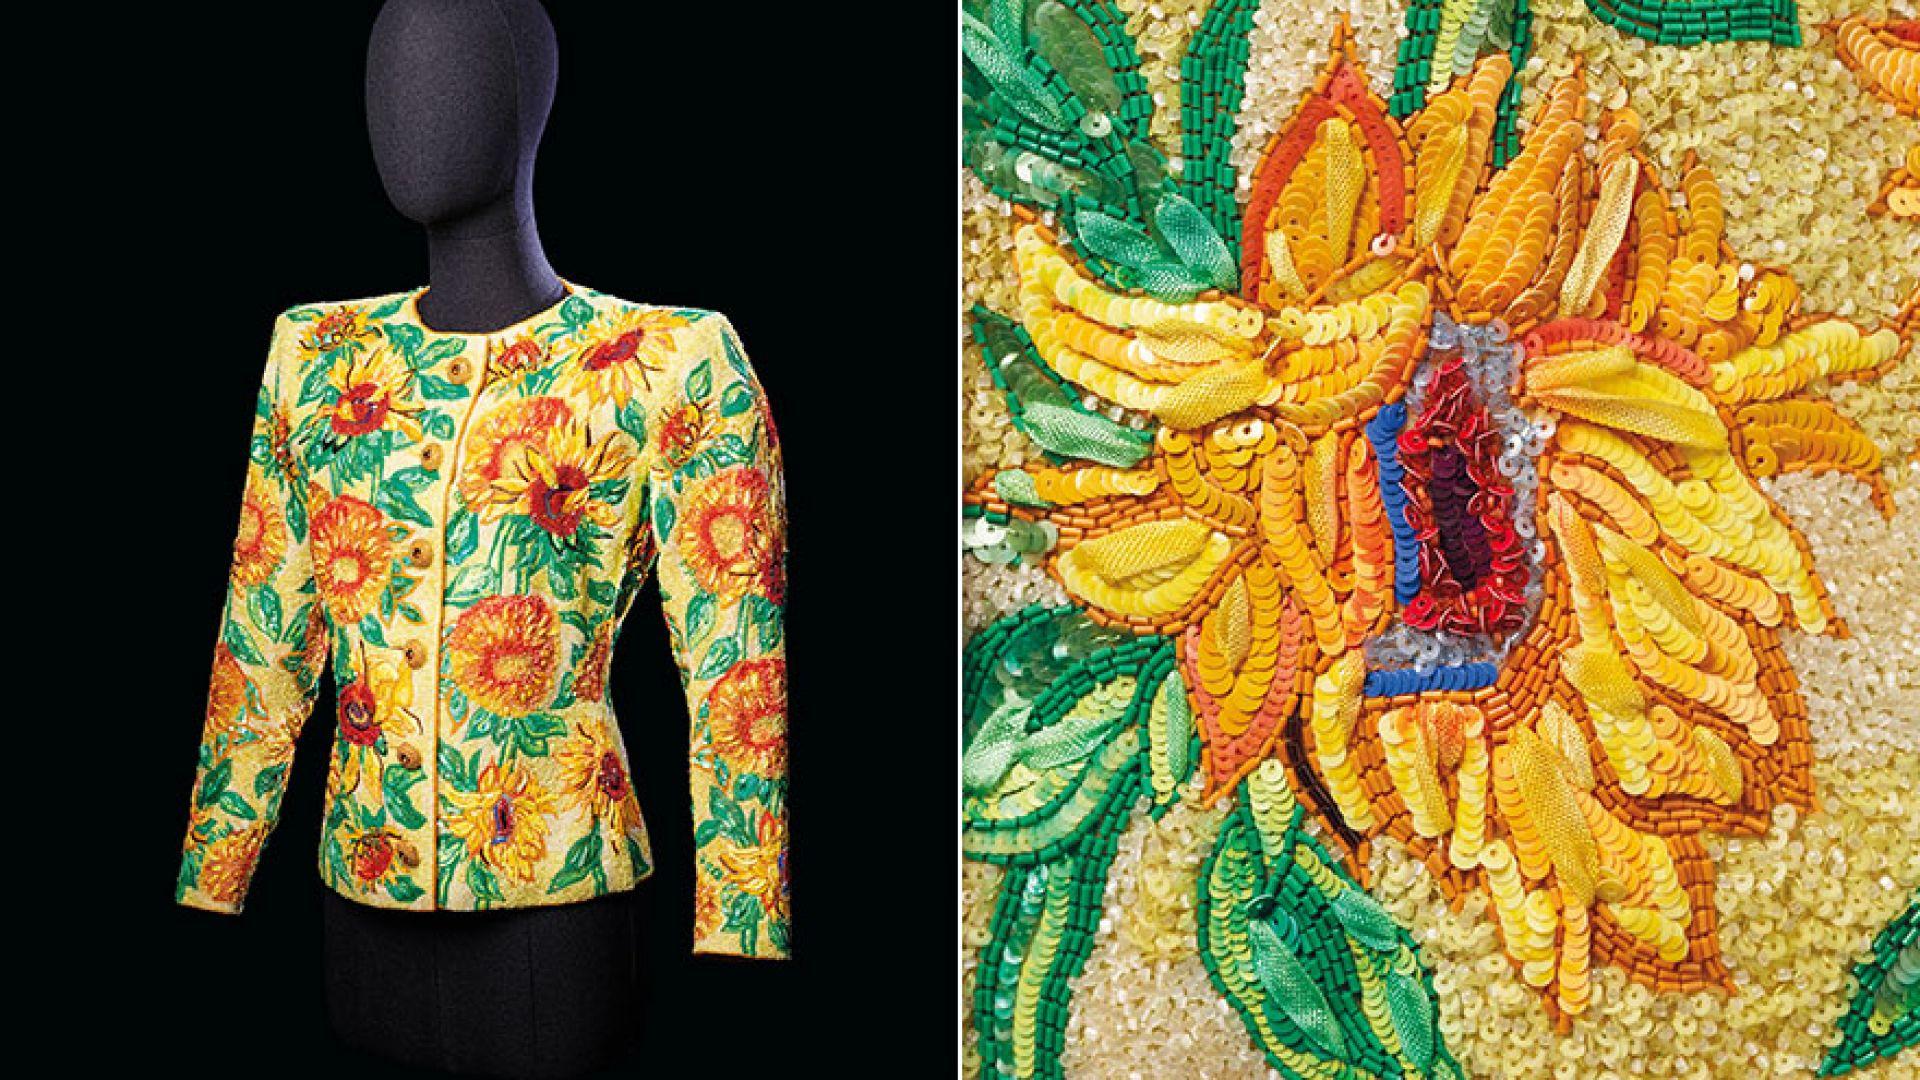 Сако на Ив Сен Лоран беше продадено на търг за рекордна сума